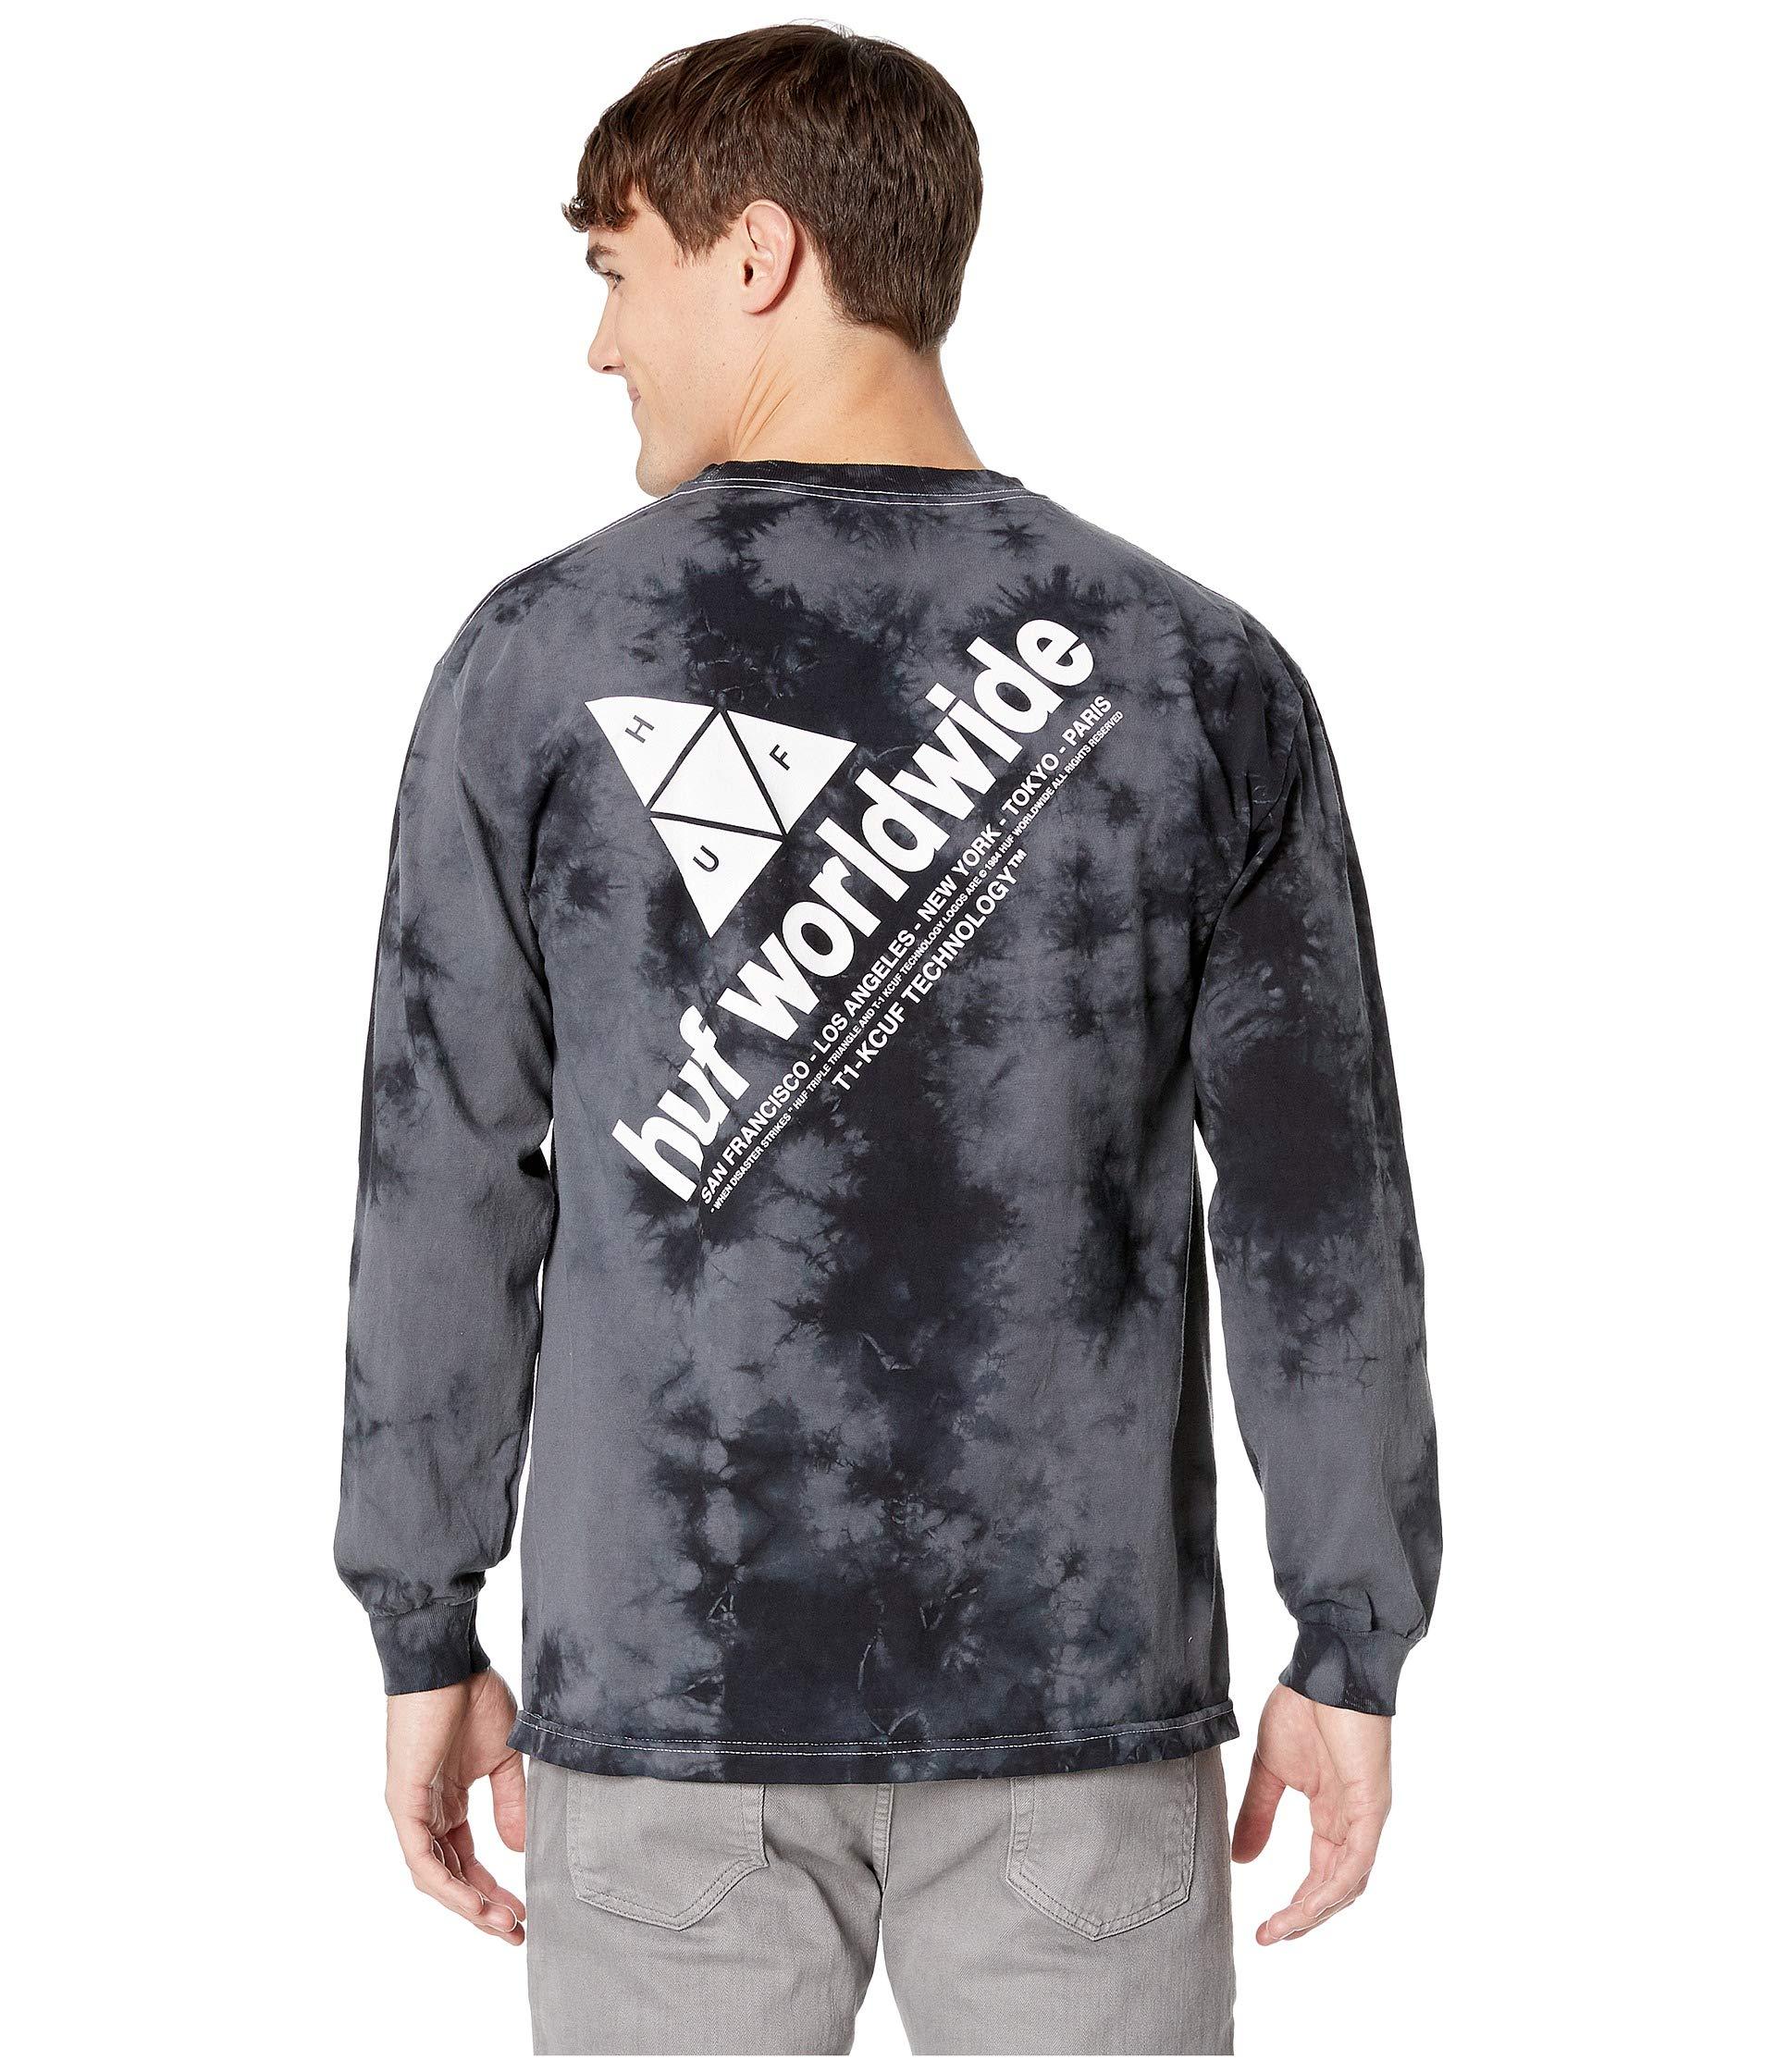 Long Tee Wash Huf Logo Peak Sleeve Crystal Black qOnUxH1wI6